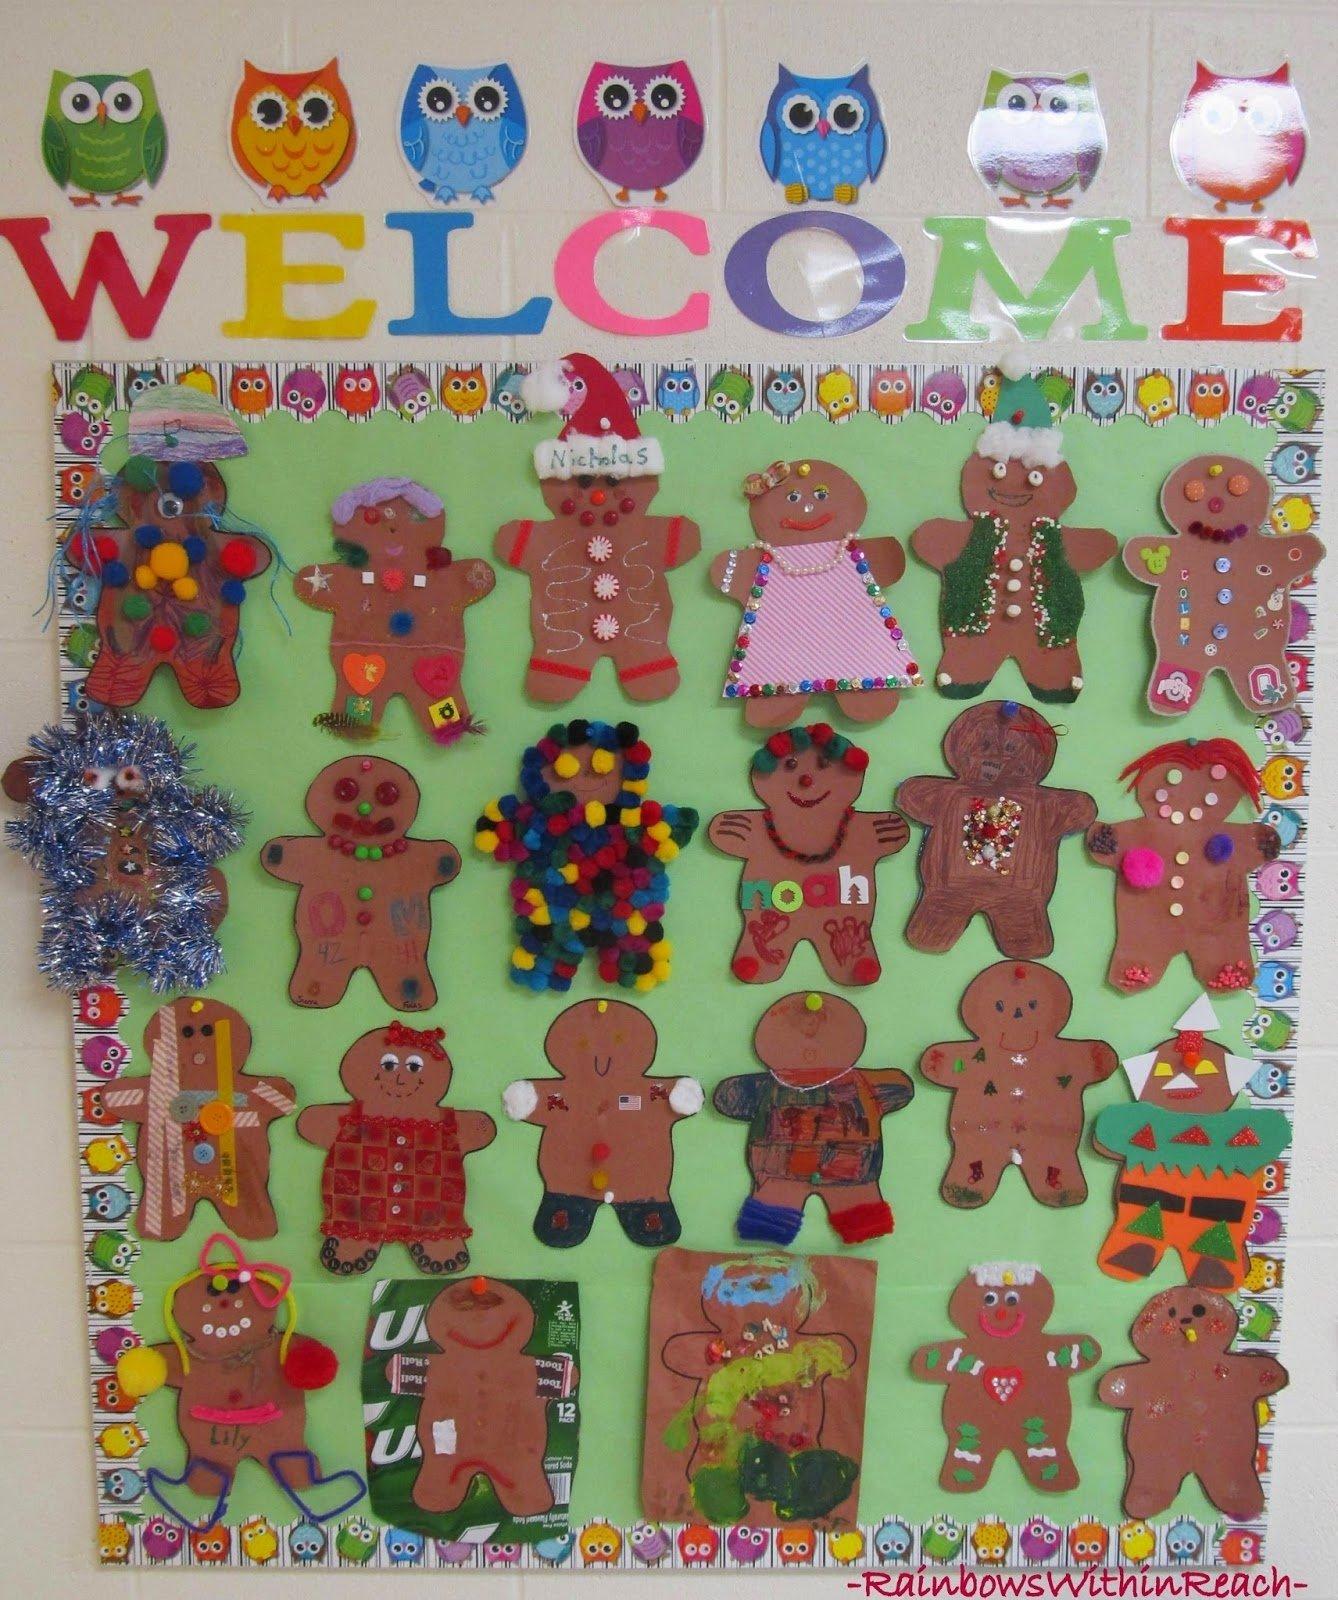 10 Perfect Gingerbread Man Bulletin Board Ideas www rainbowswithinreach blogspot 7 2020